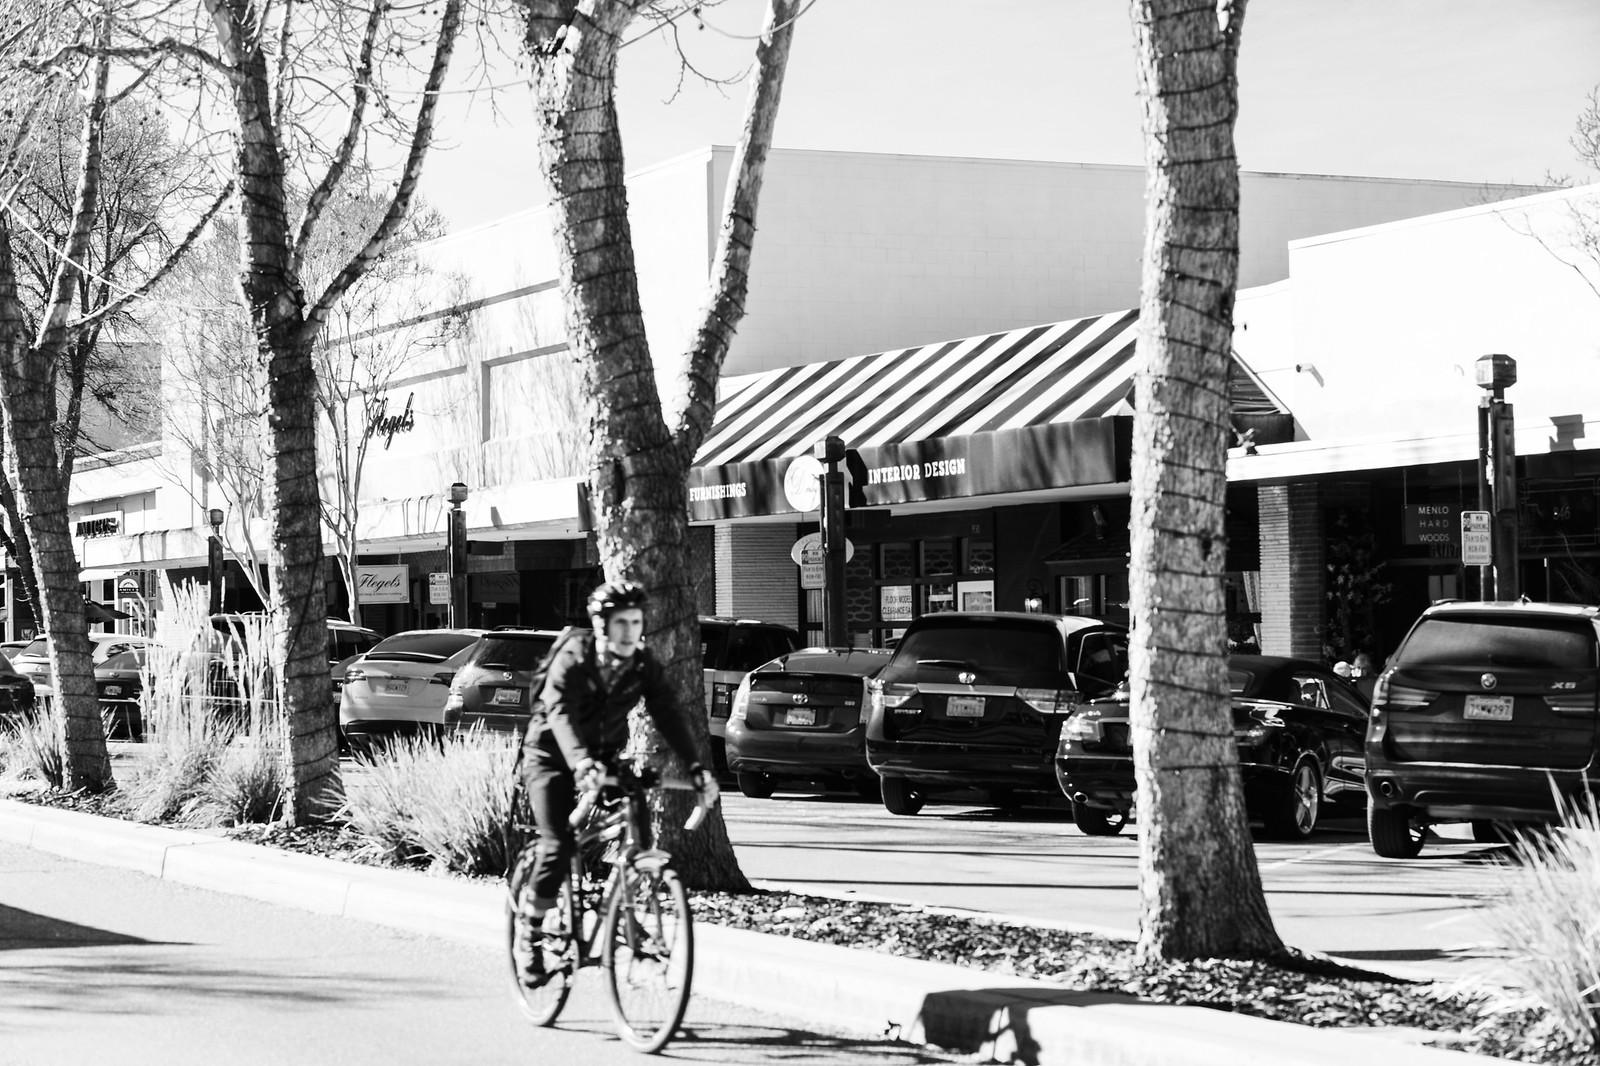 Downtown Menlo Park Blu Skye Media-5115-X3.jpg